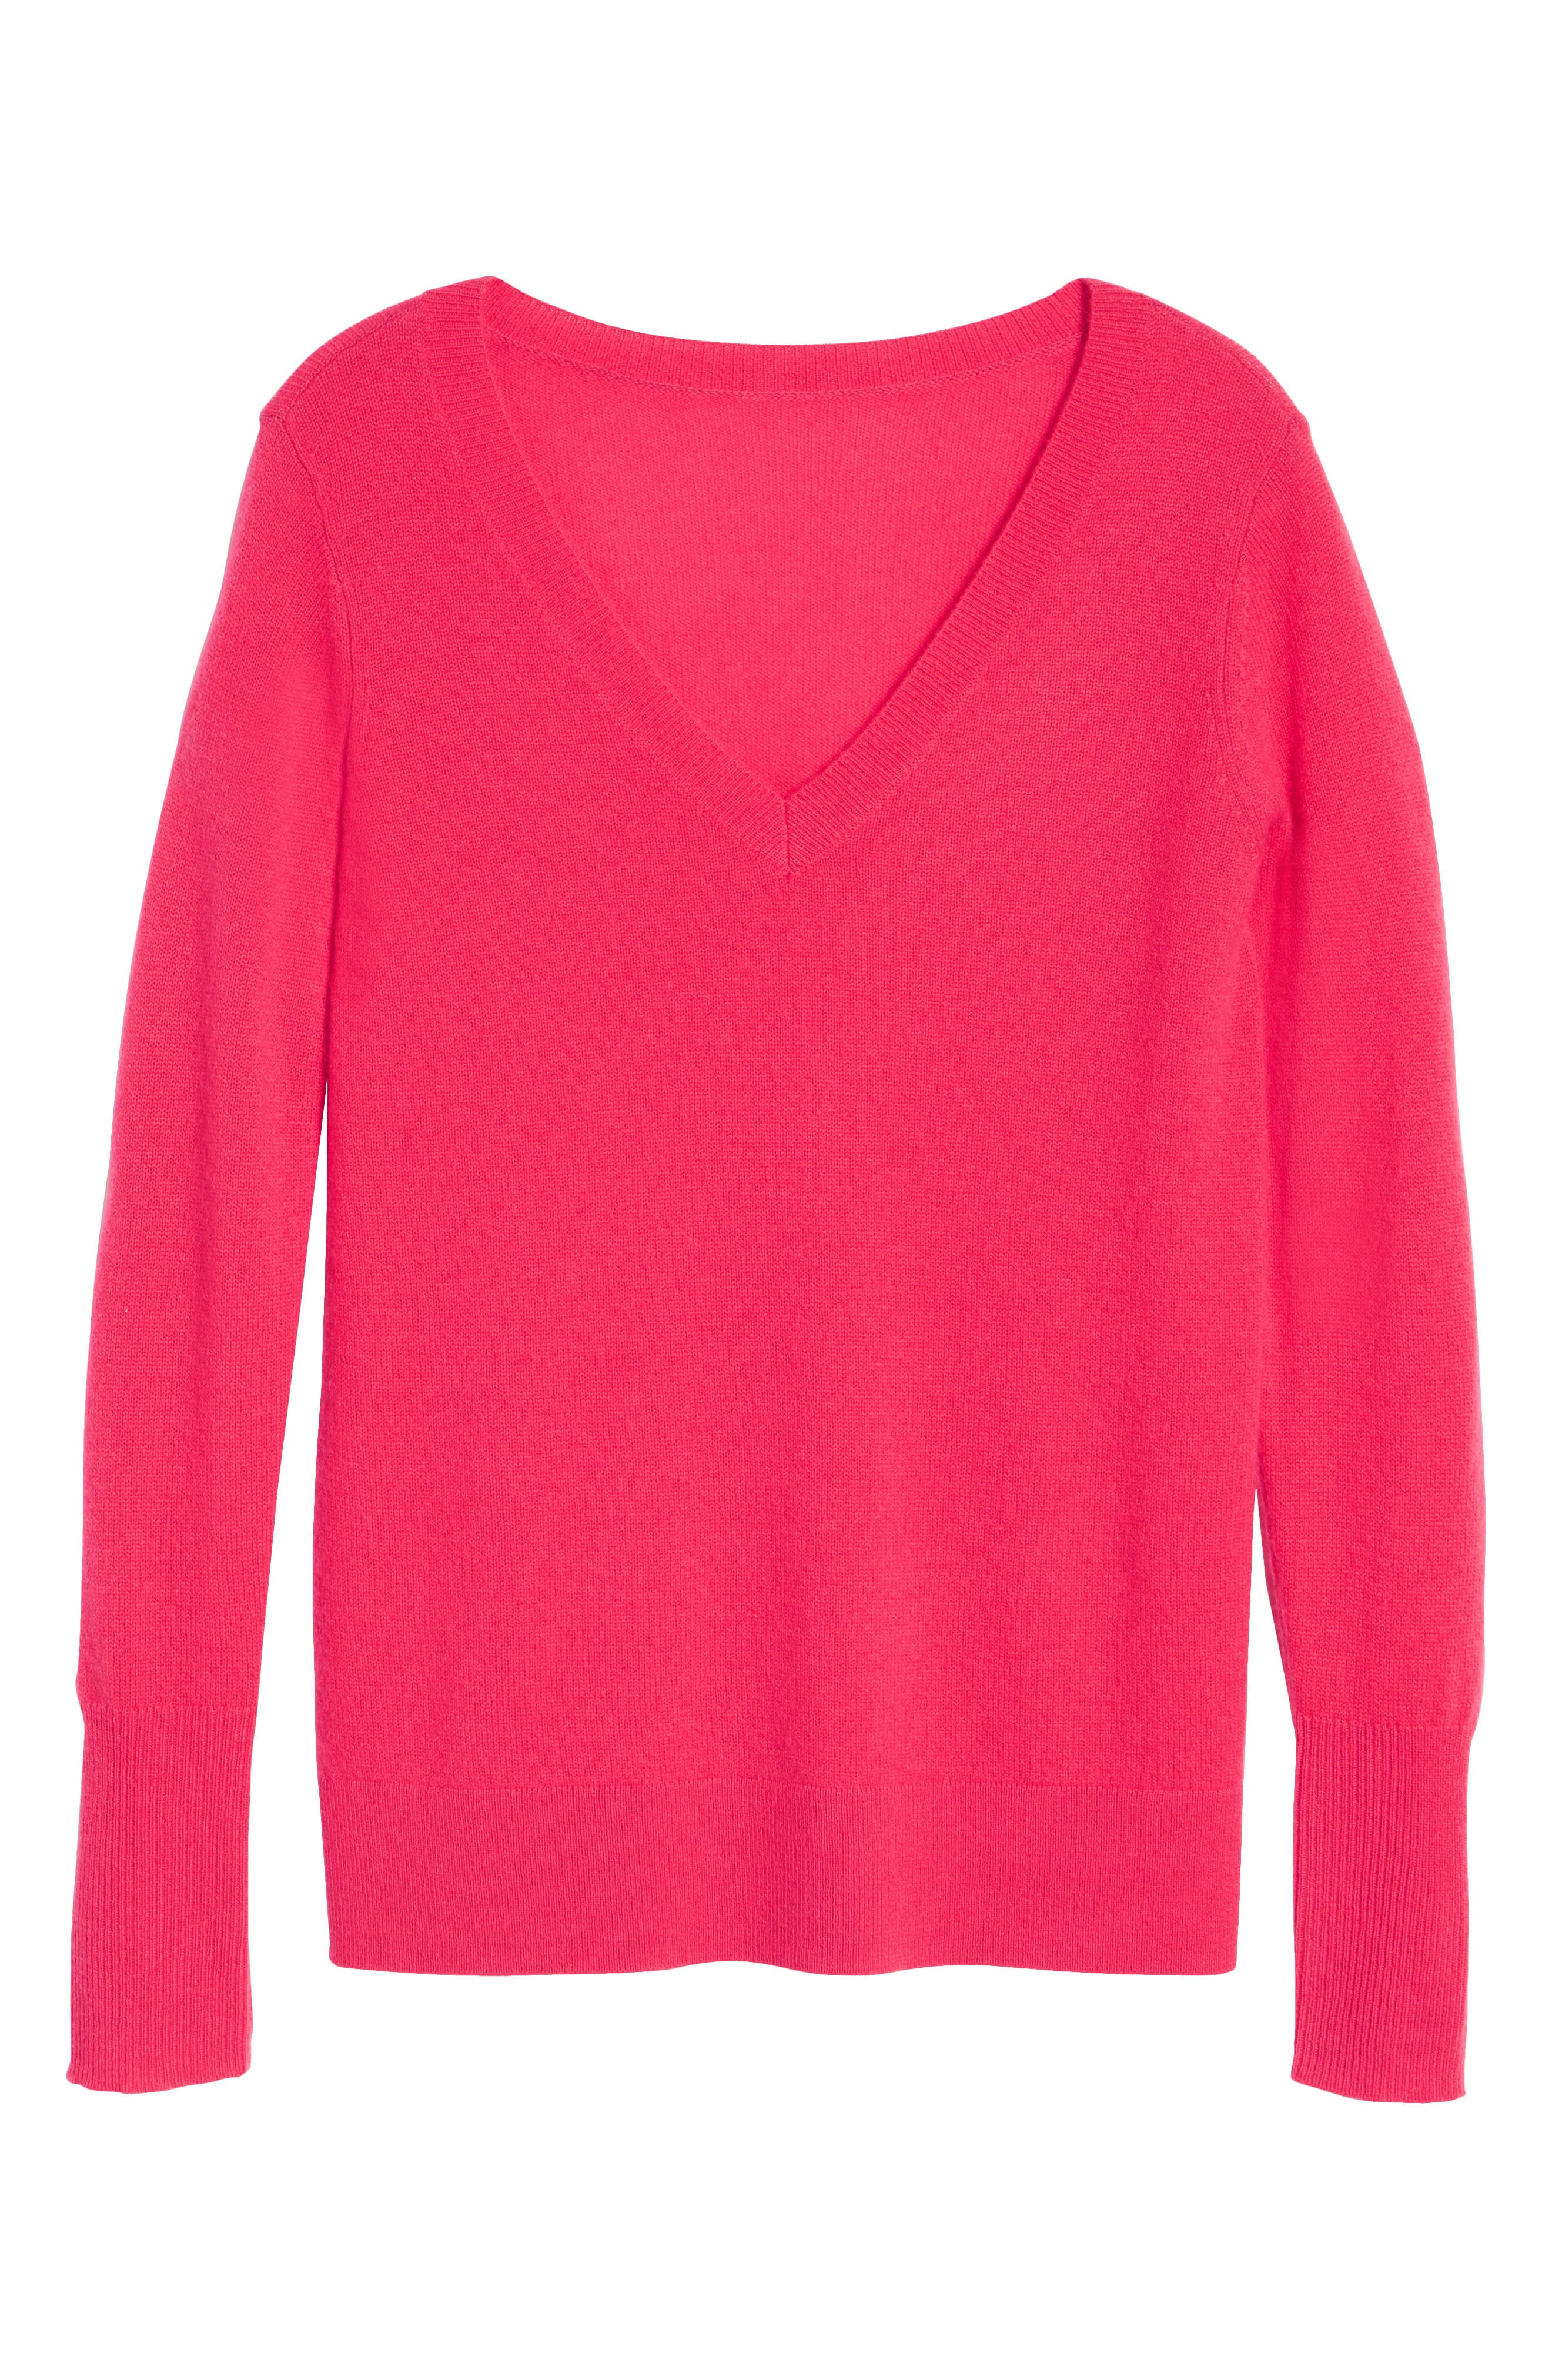 ,                             V-Neck Cashmere Sweater,                             Alternate thumbnail 64, color,                             651